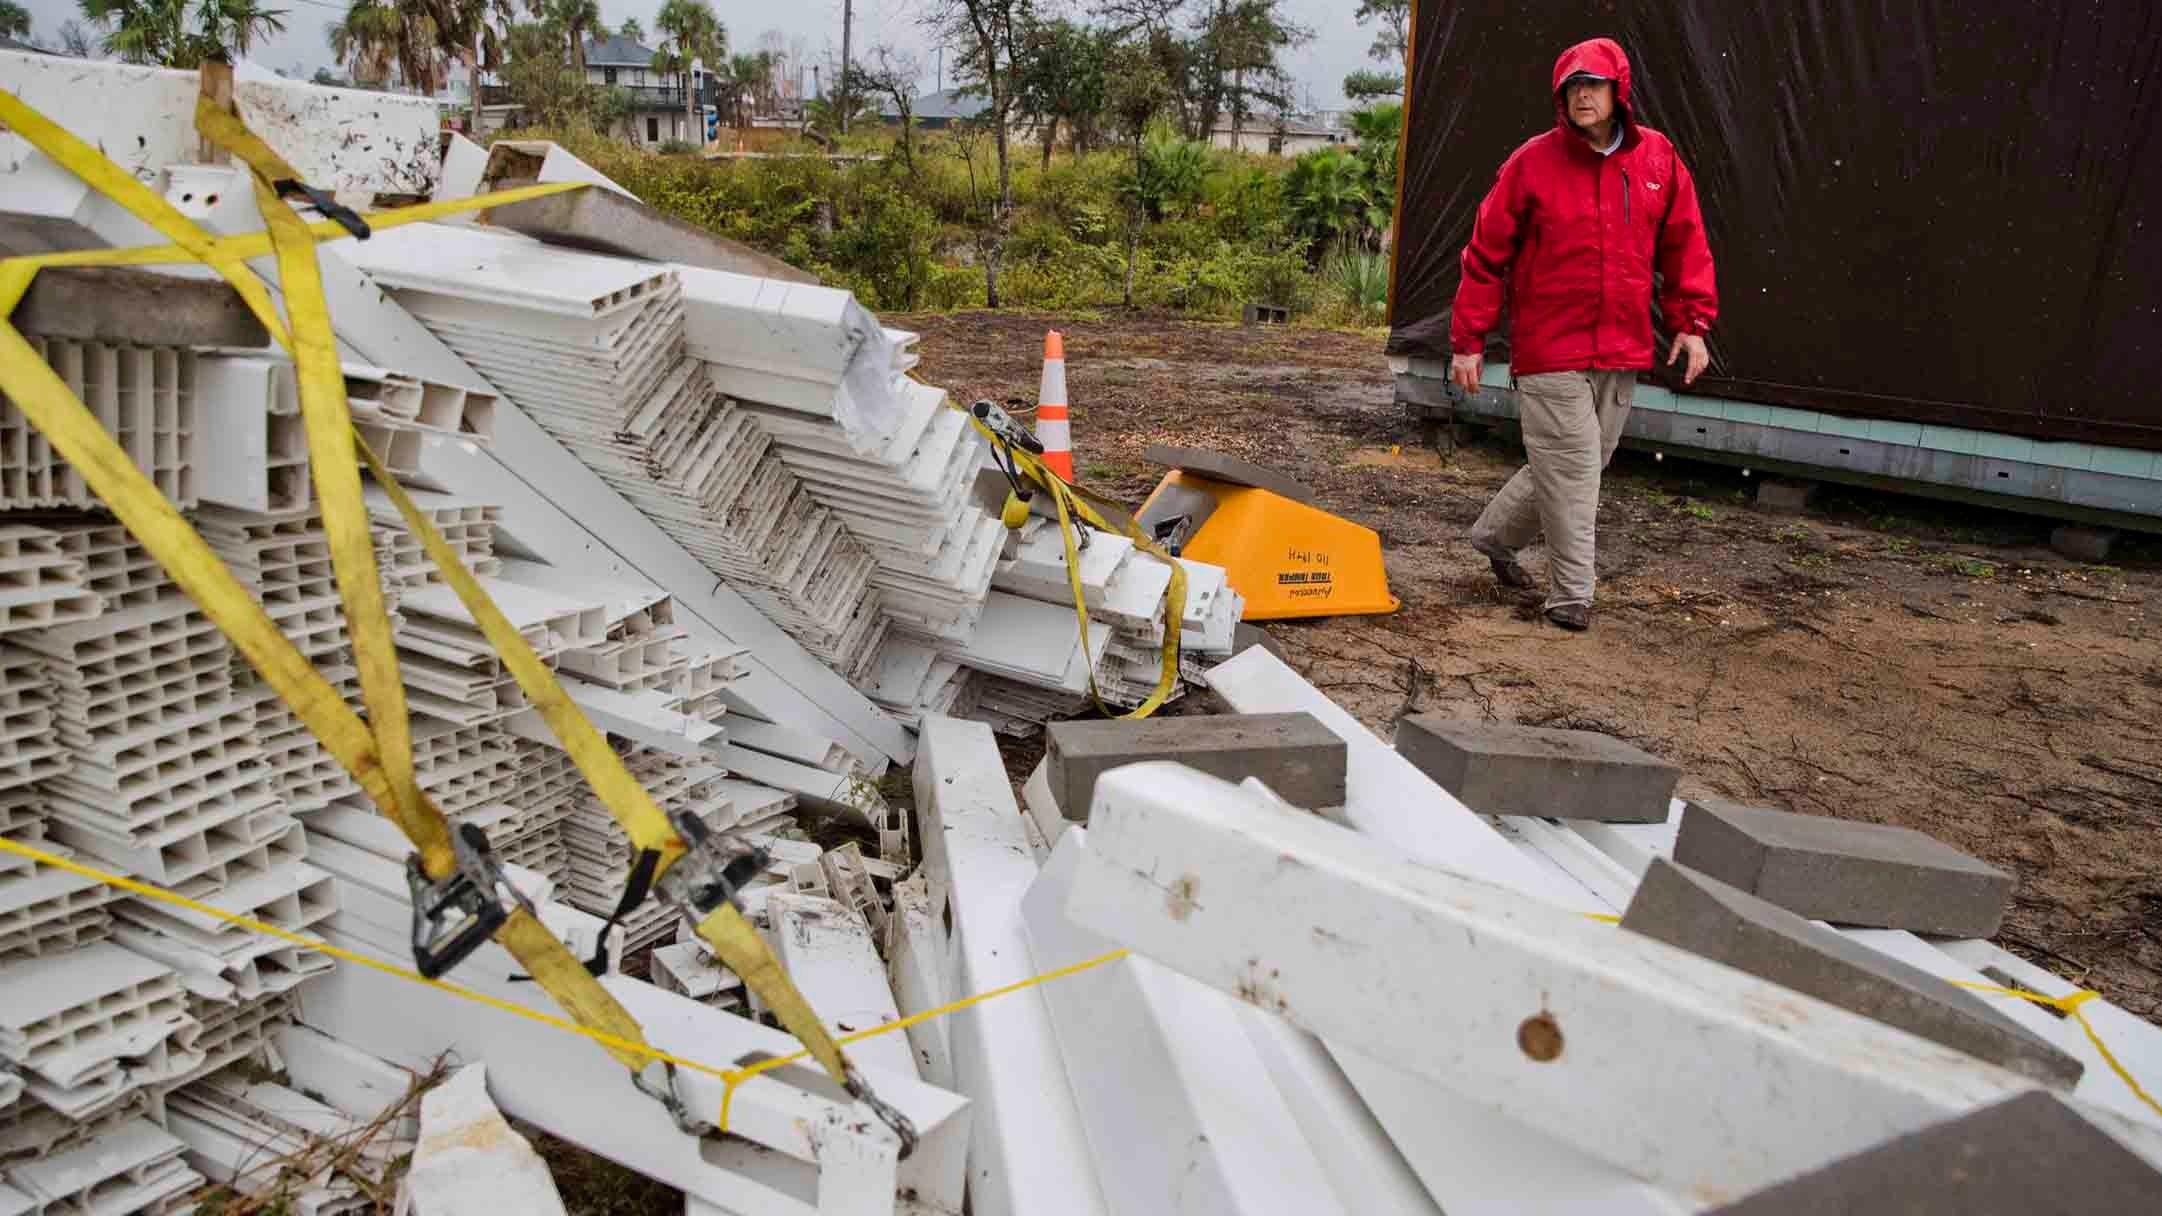 Tornadoes Spawned by Tropical Storm Nestor Strike Central Florida